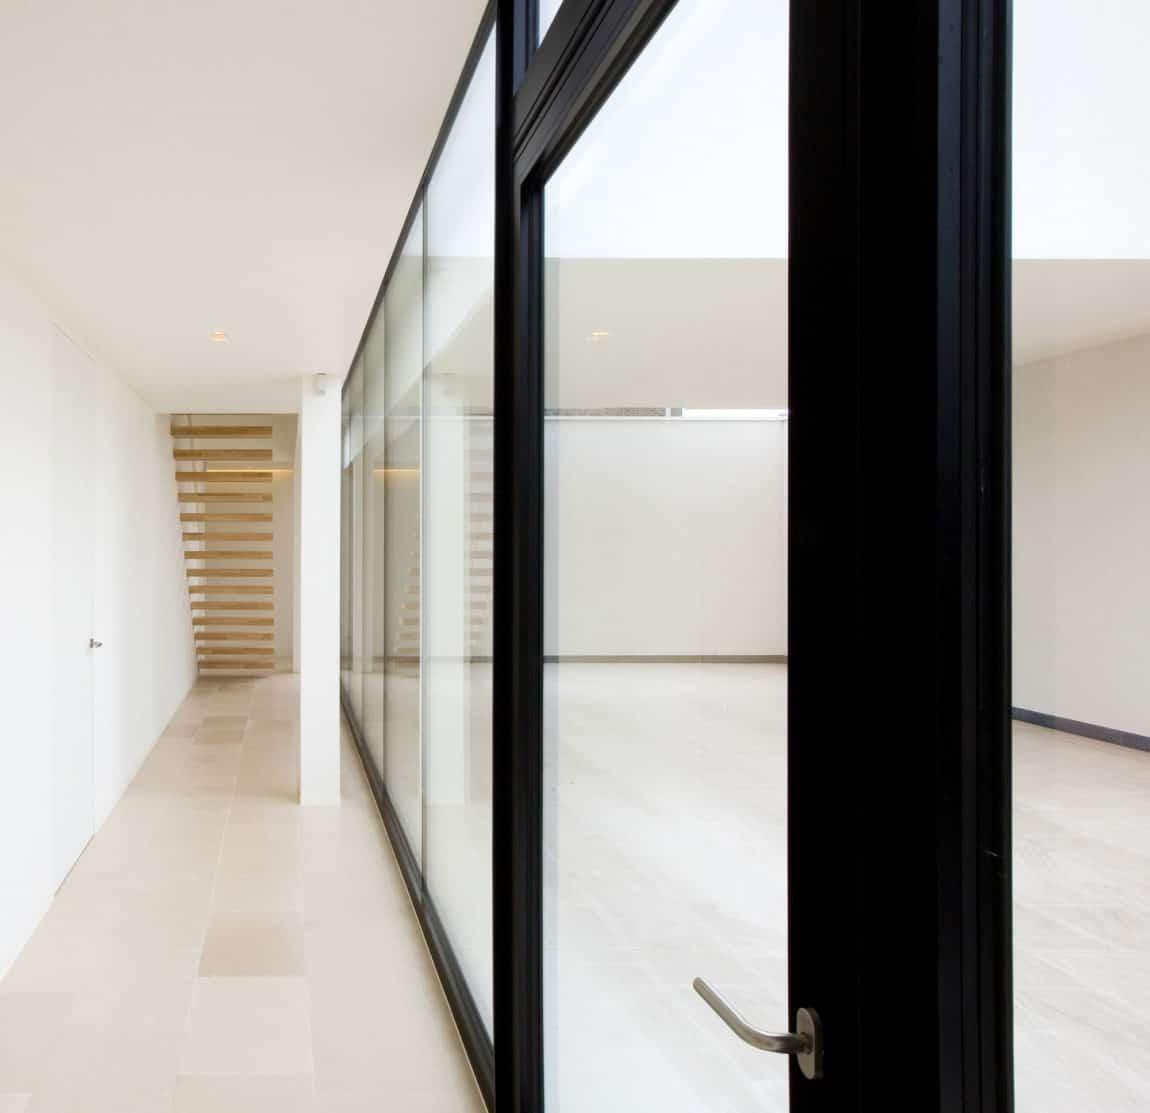 House VRT by DE JAEGHERE Architectuuratelier (9)